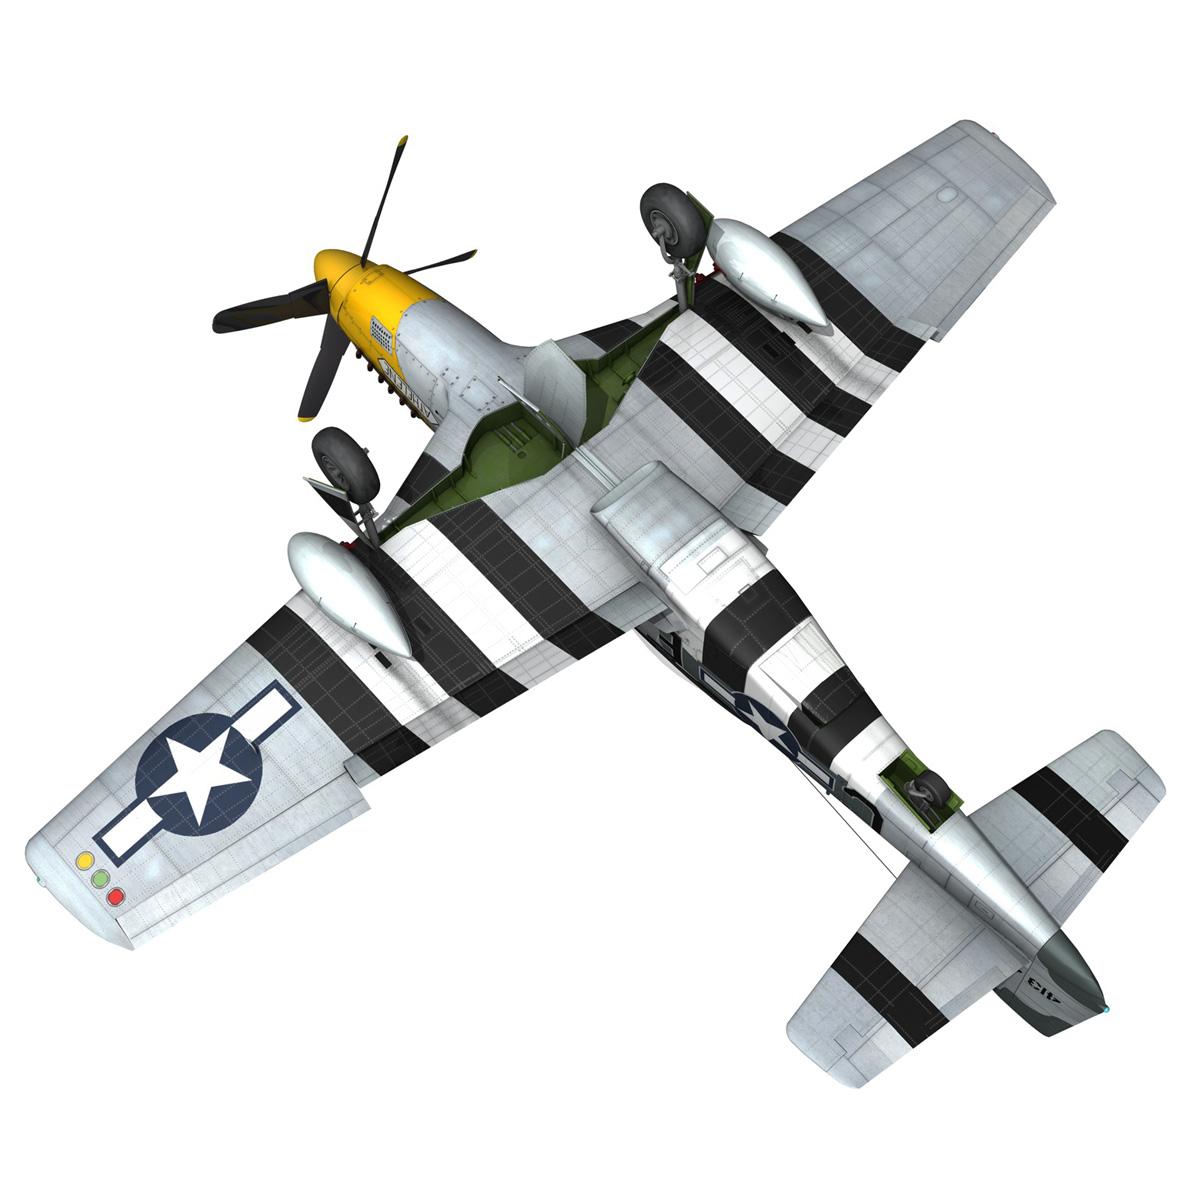 north american p-51d mustang – lou iv 3d model fbx c4d lwo obj 272614